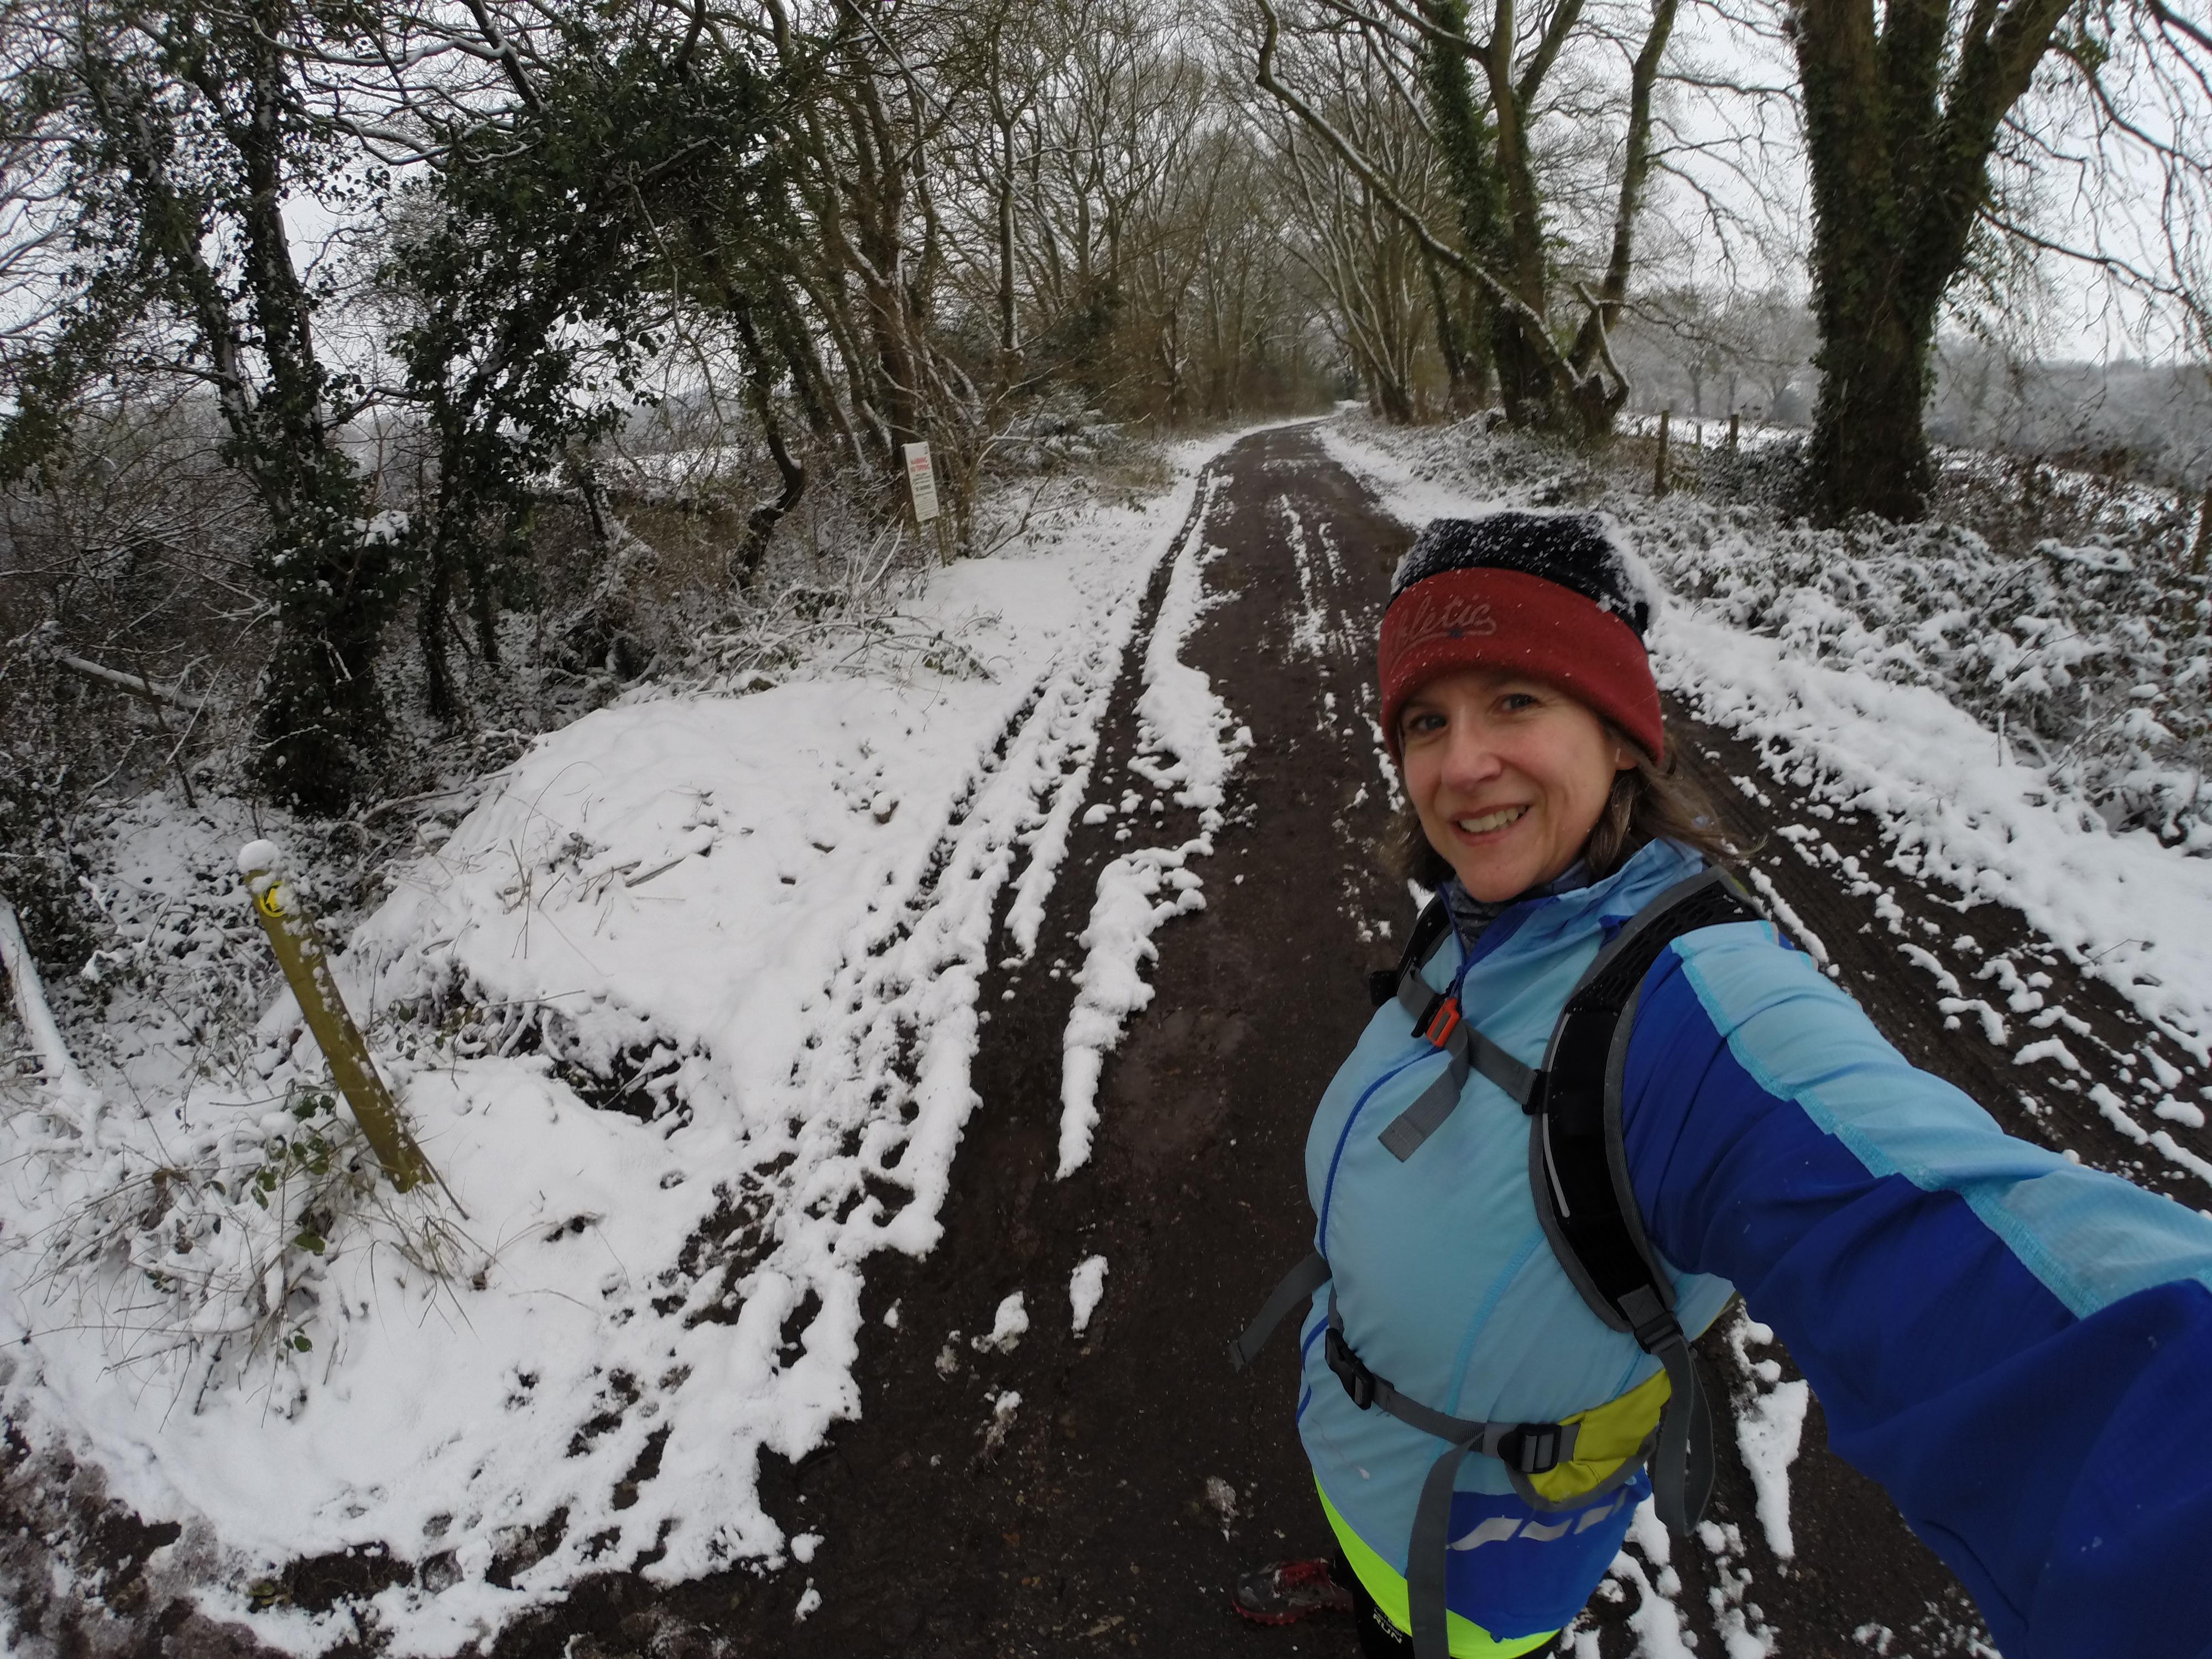 A snowy run